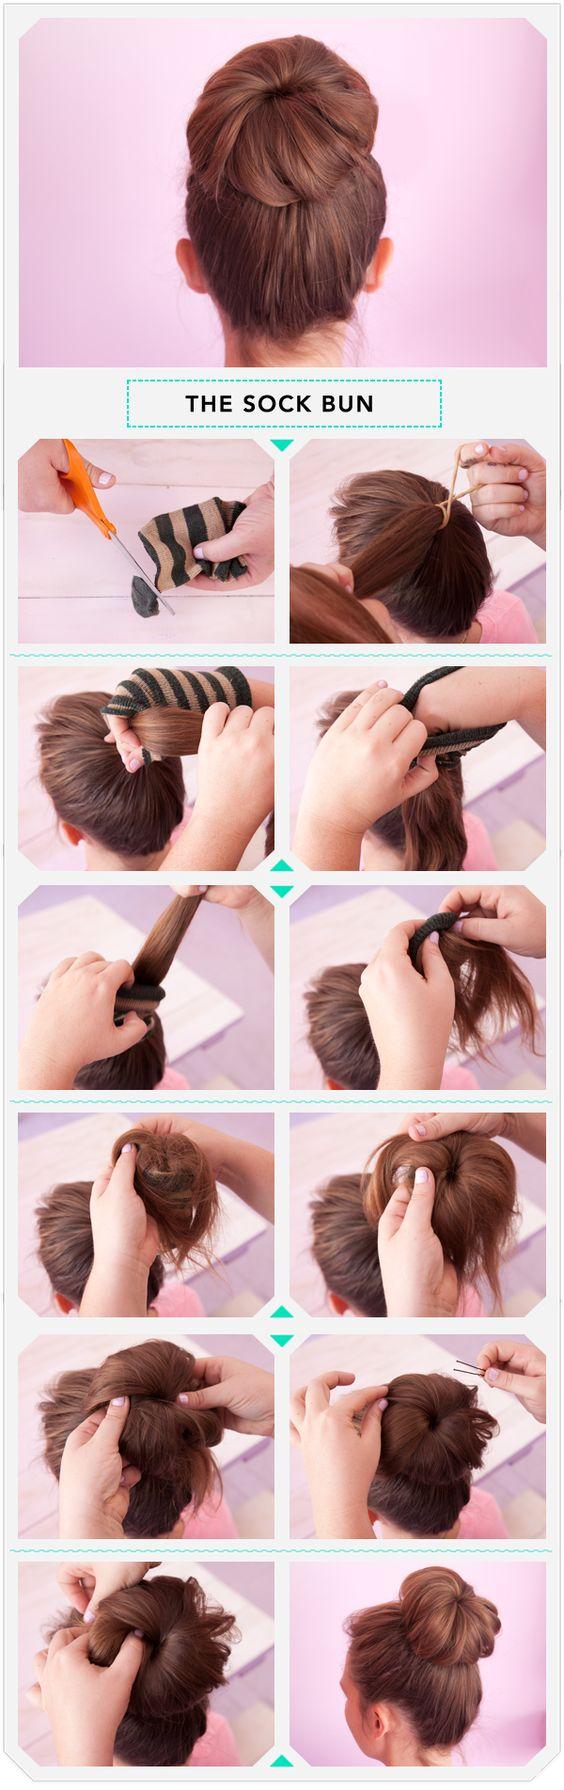 how to: the sock bun